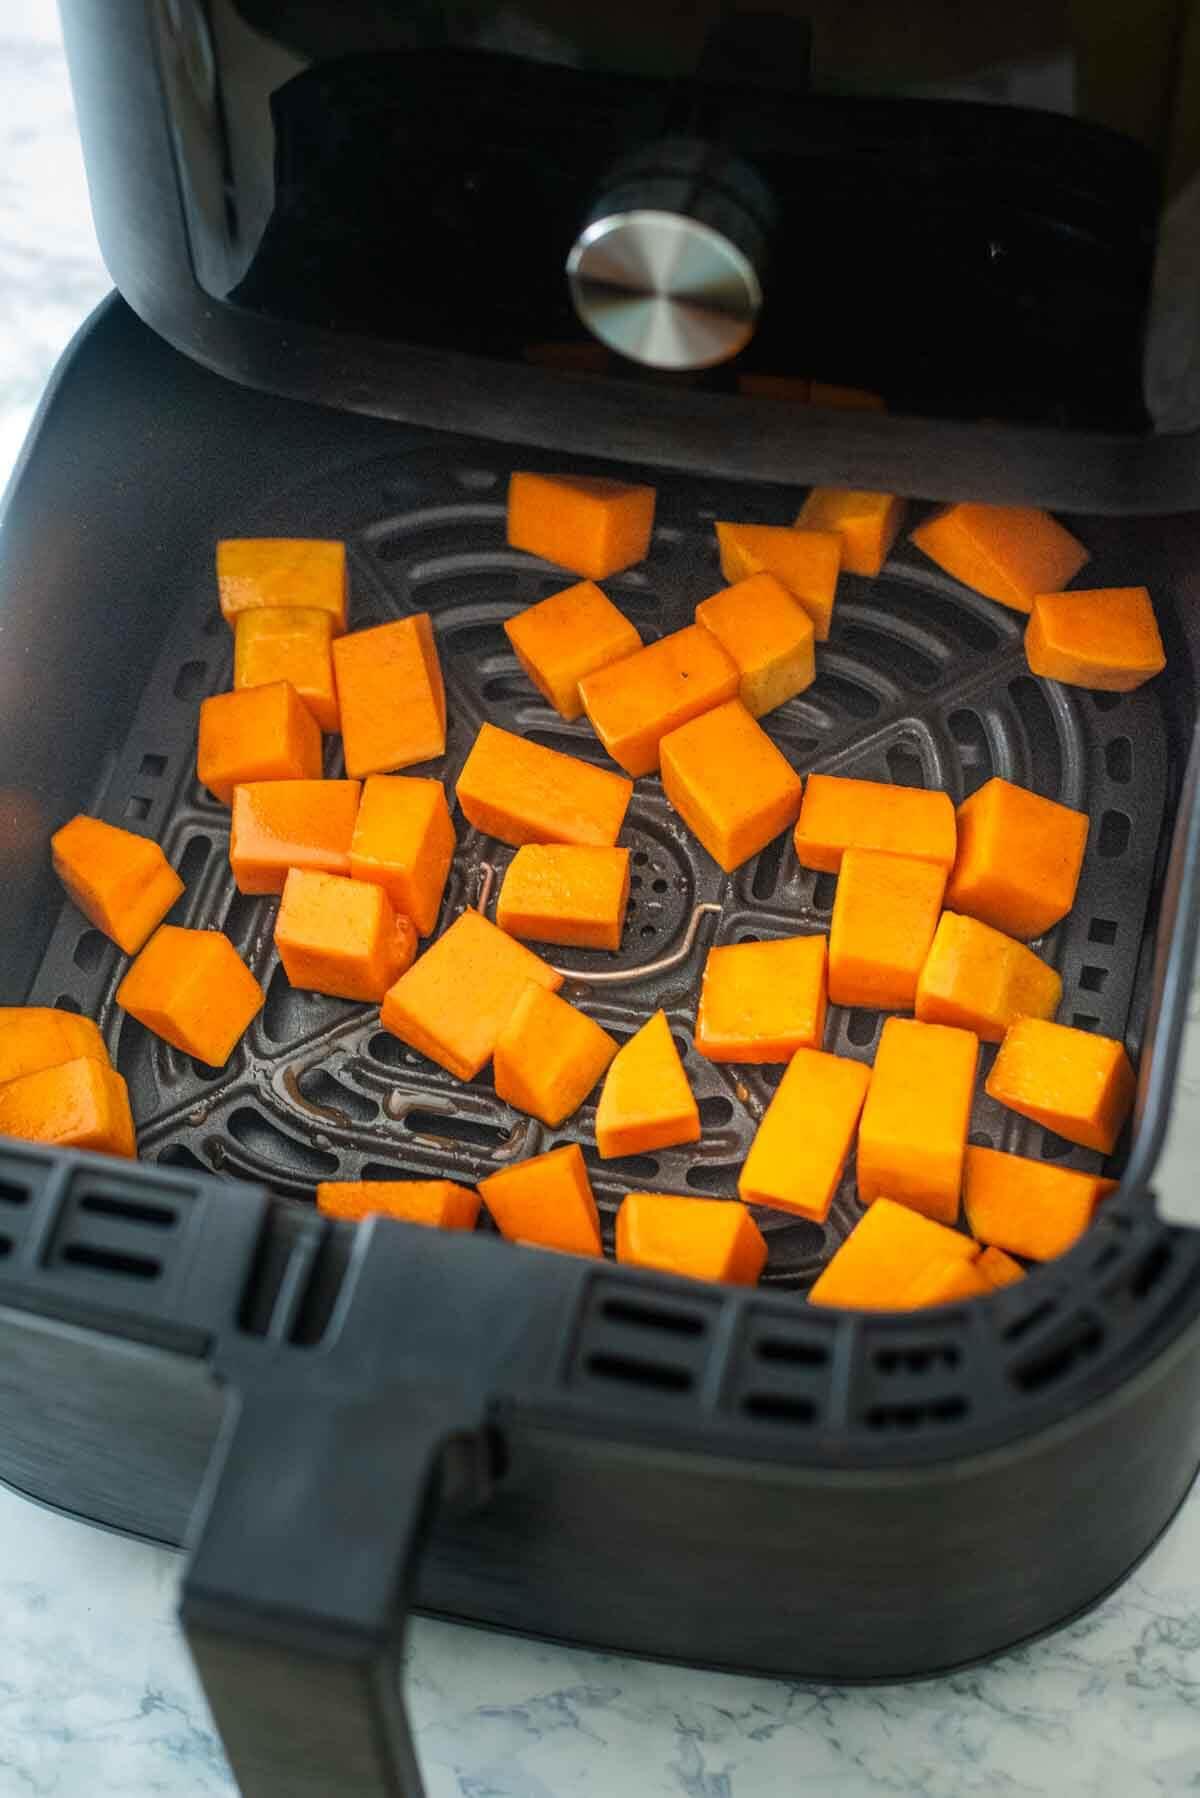 butternut squash pieces in an air fryer